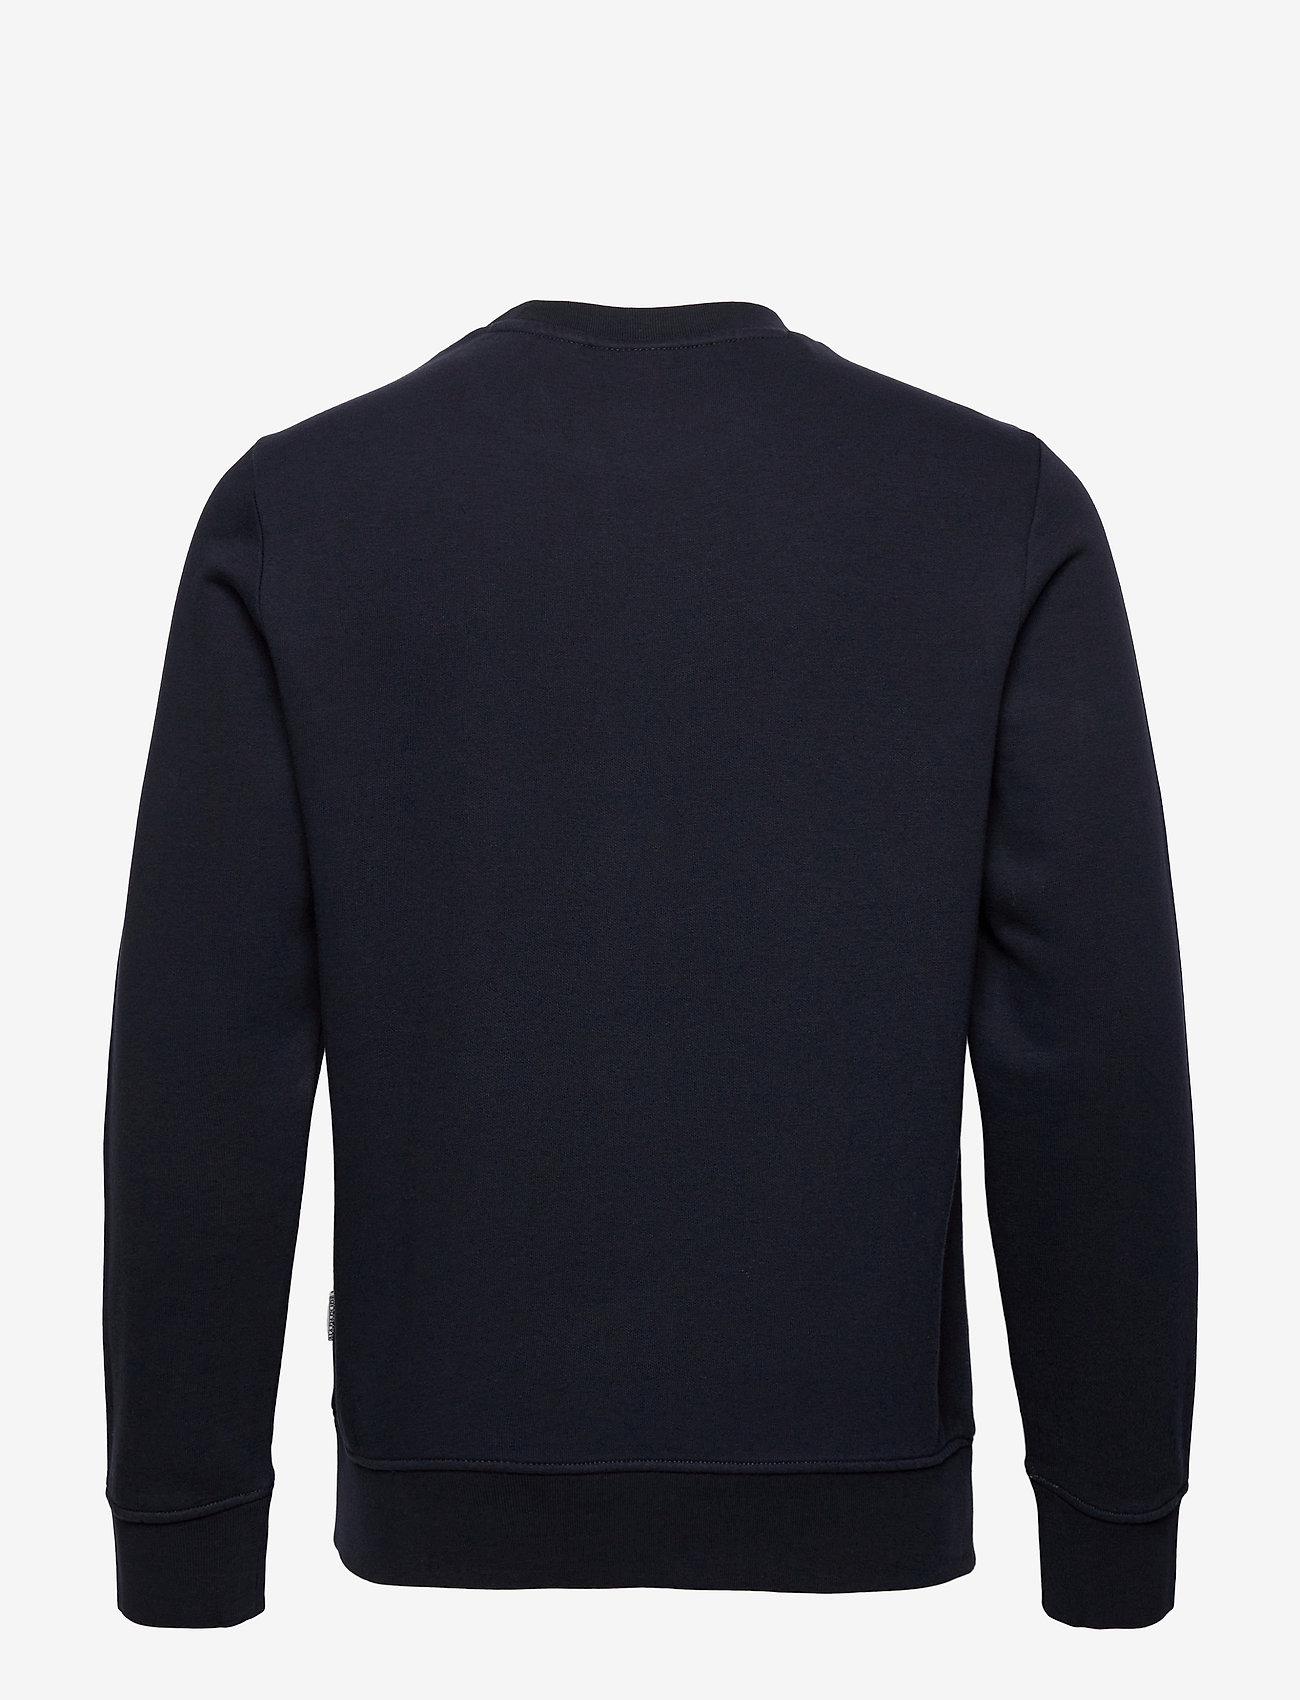 Napapijri - BALLAR C - sweats - blue marine - 1